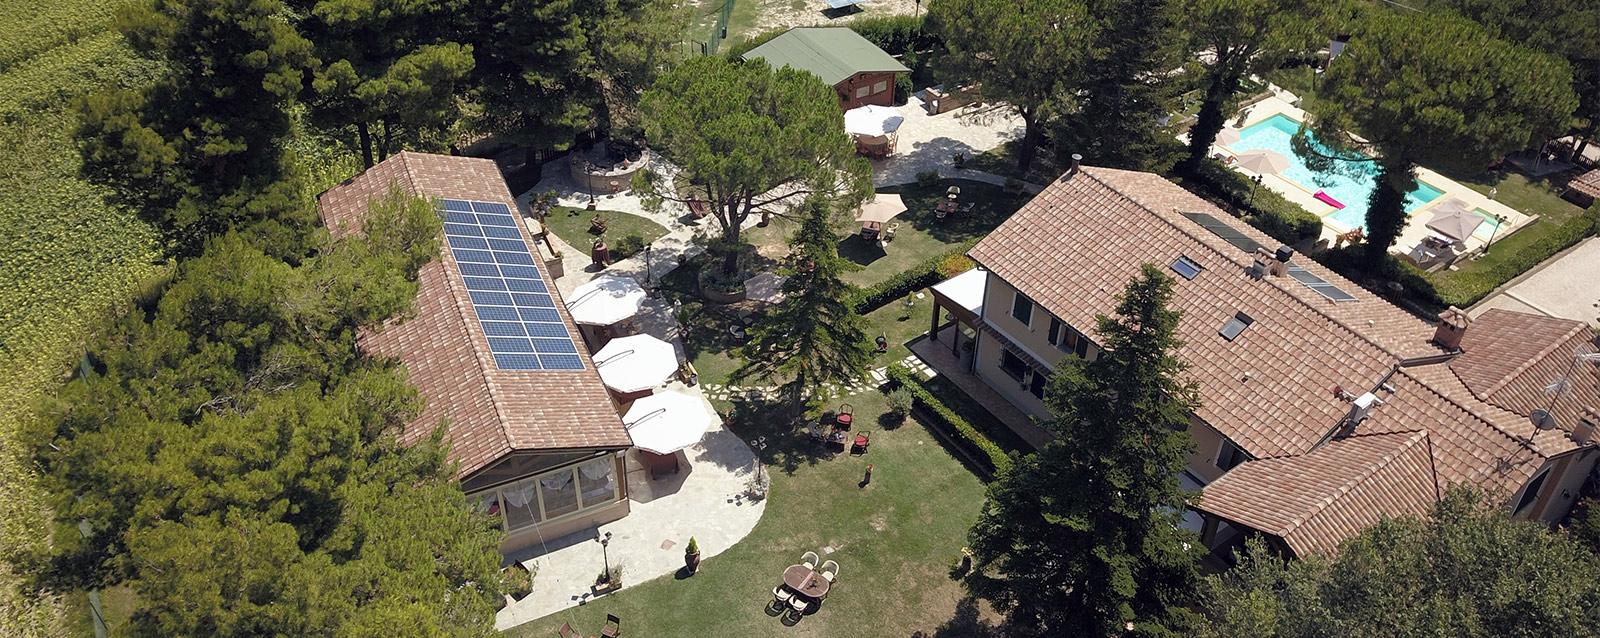 Agriturismo Le Quiete Dimore - Pesaro e Urbino - il giardino